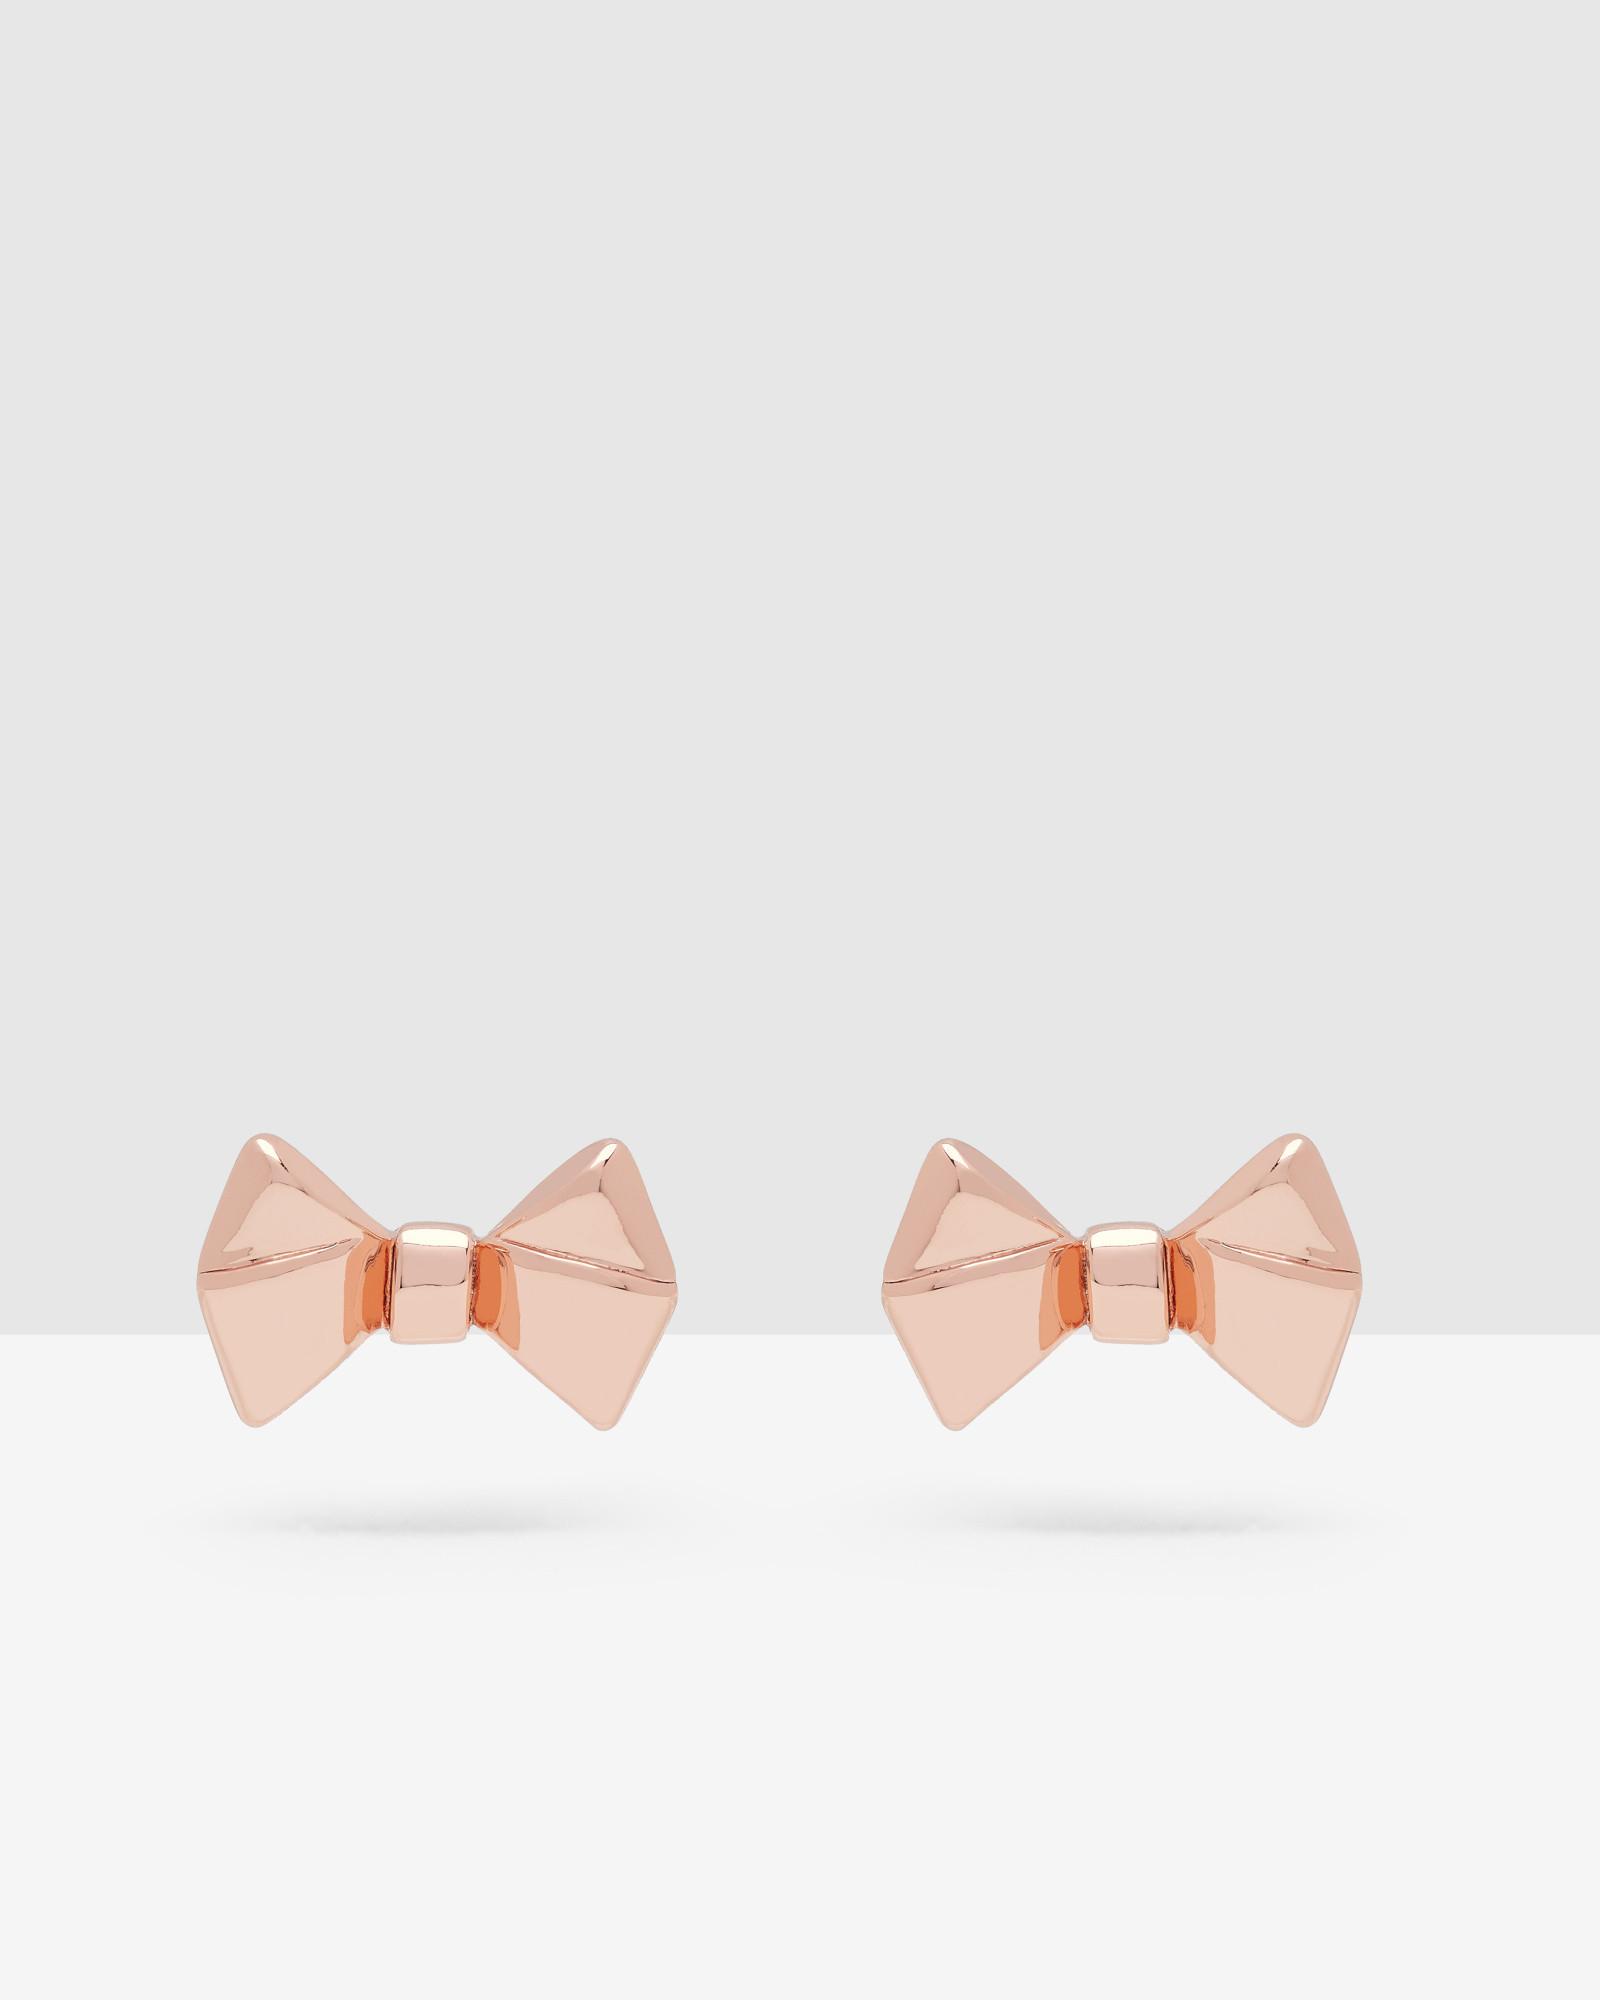 Ted baker Bow Stud Earrings in Pink